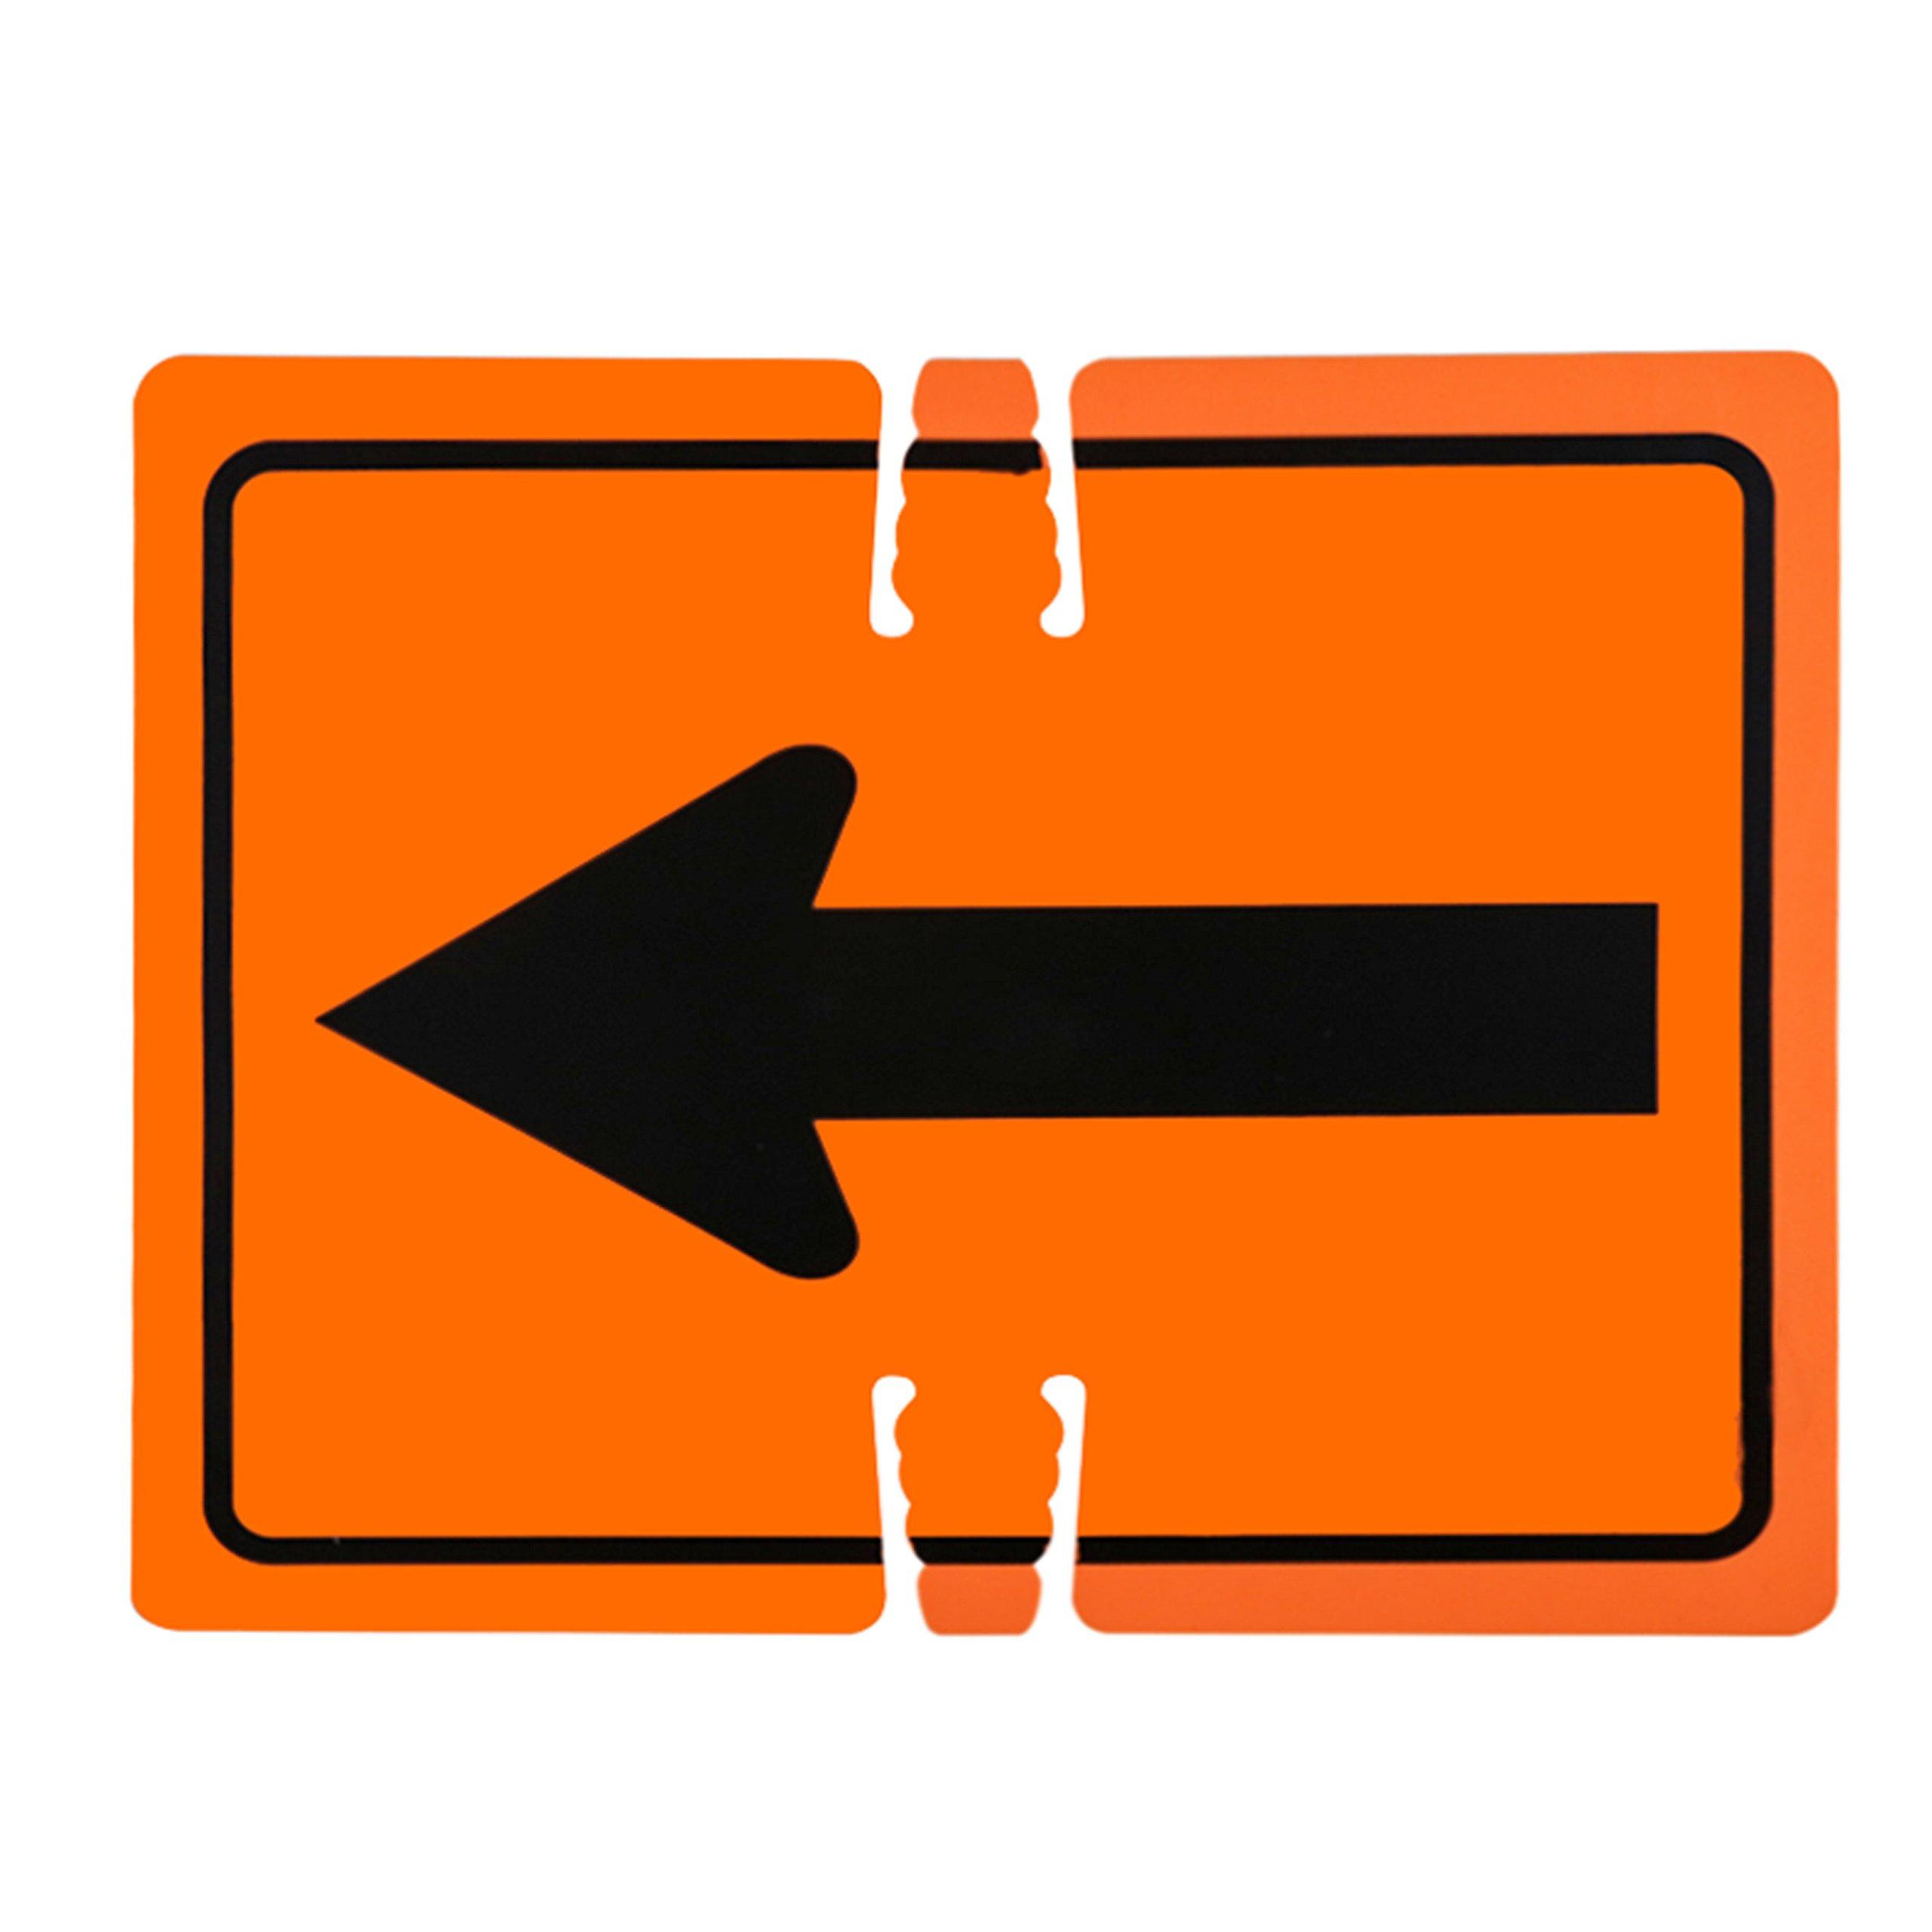 RK Traffic Cone Sign 21 Legend ''Left Arrow'', 18'' Width x 14'' Height, Black on Orange